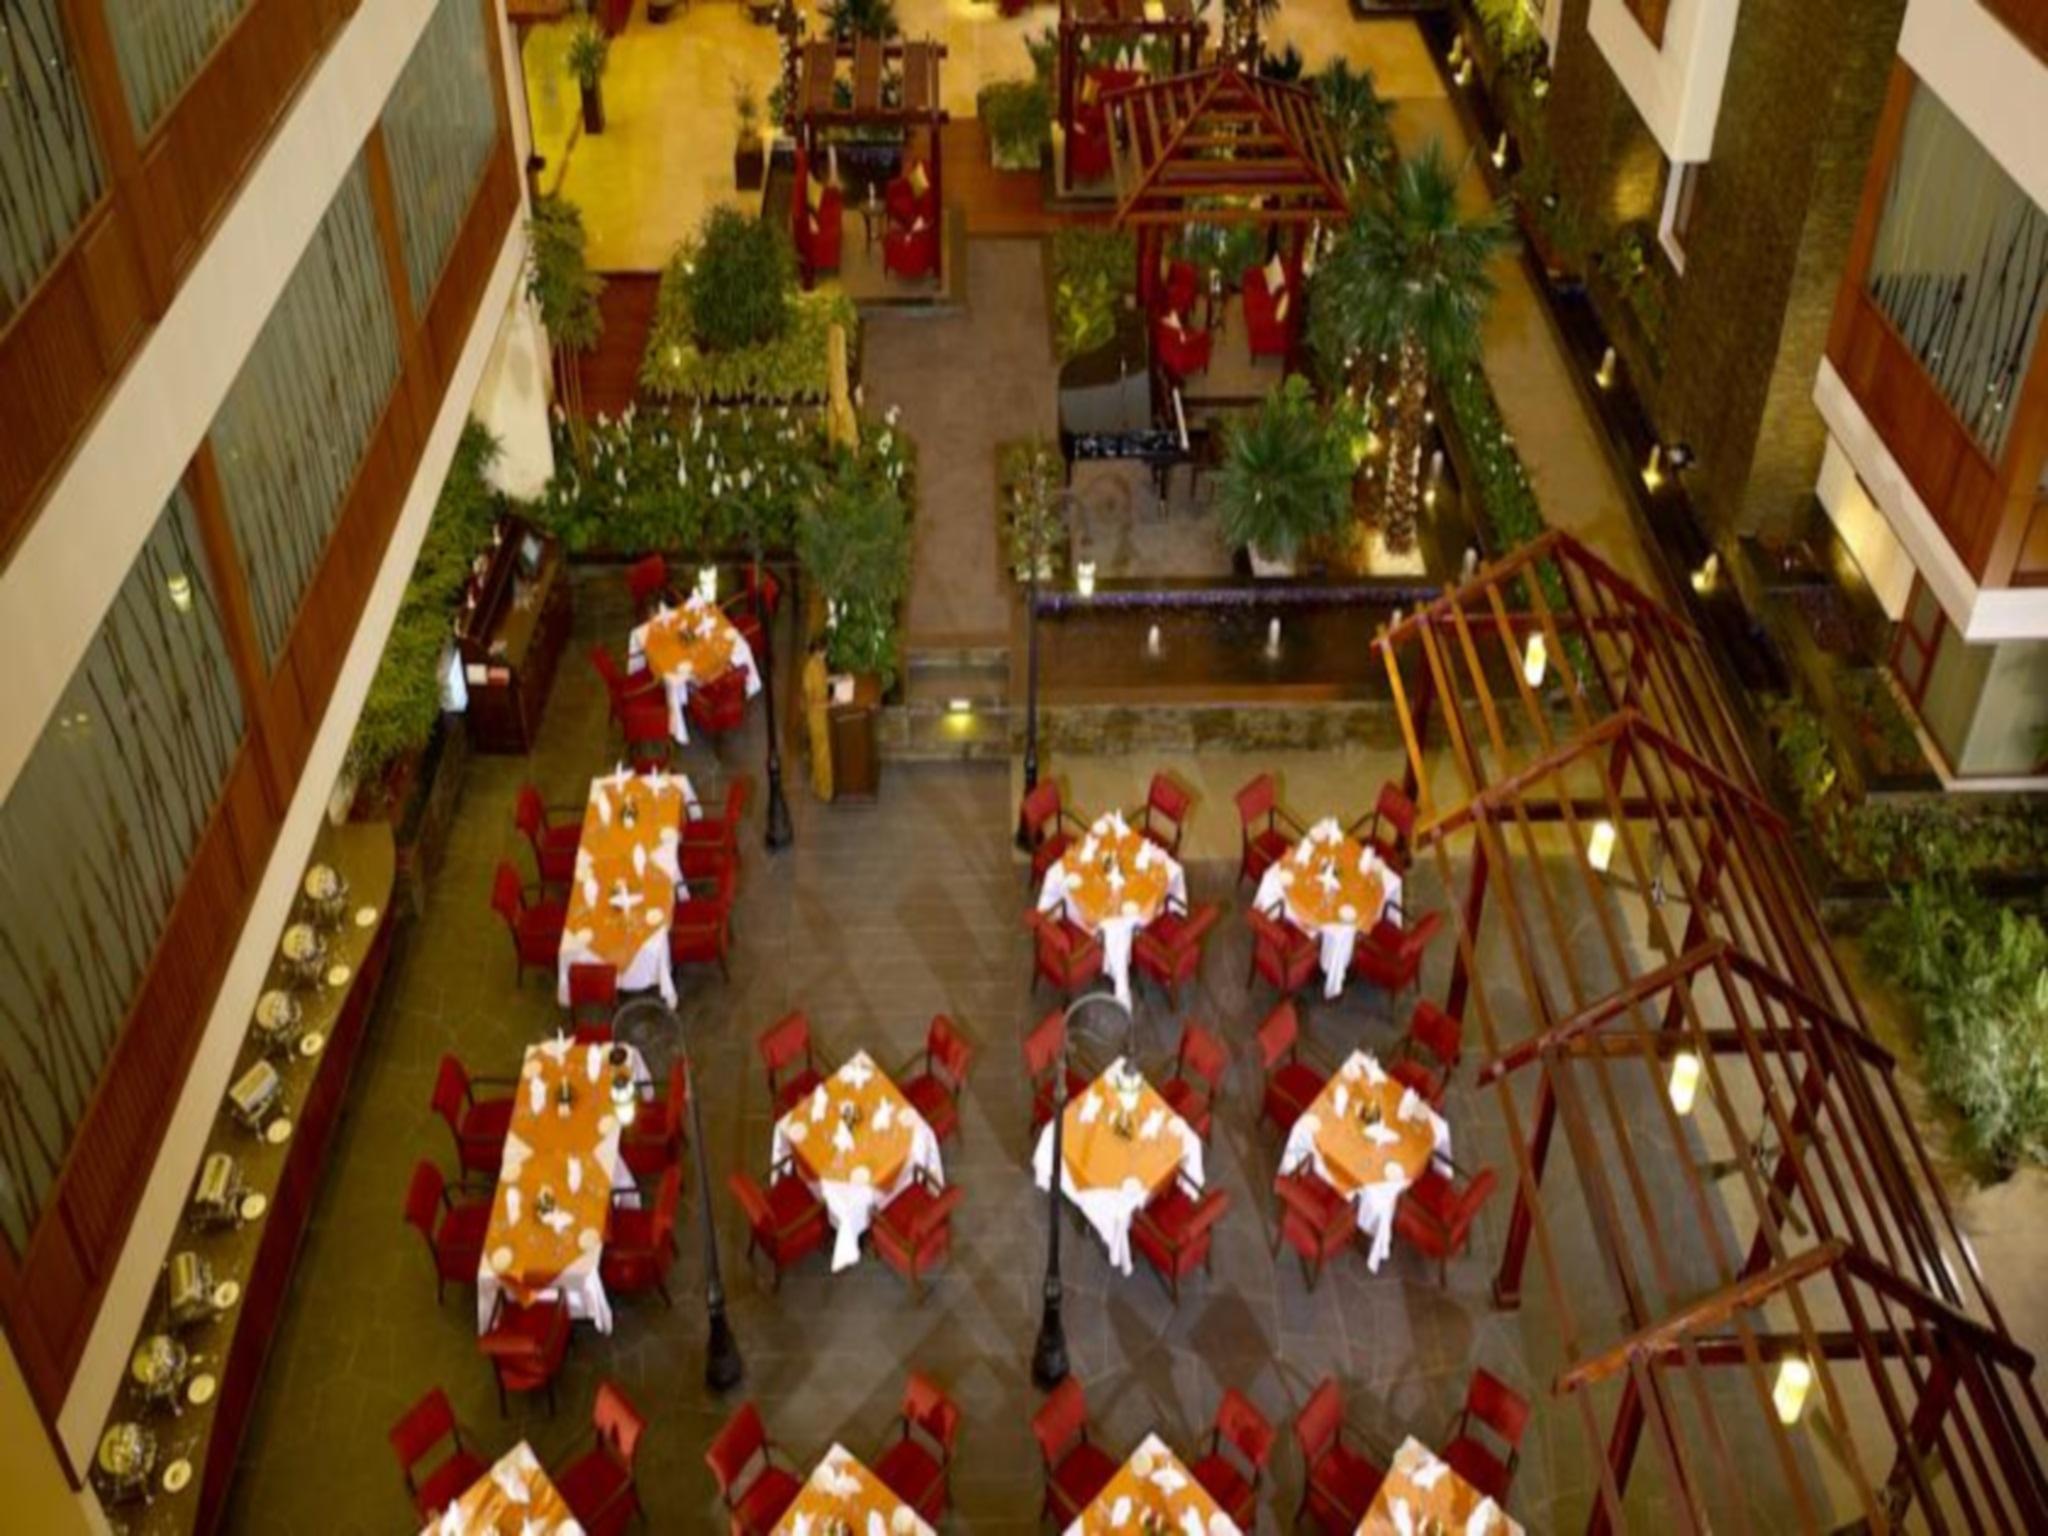 kitchen design bangalore used equipment 班加罗尔保罗酒店 the paul hotel 豪华型 预订优惠价格 地址 关于班加罗尔保罗酒店